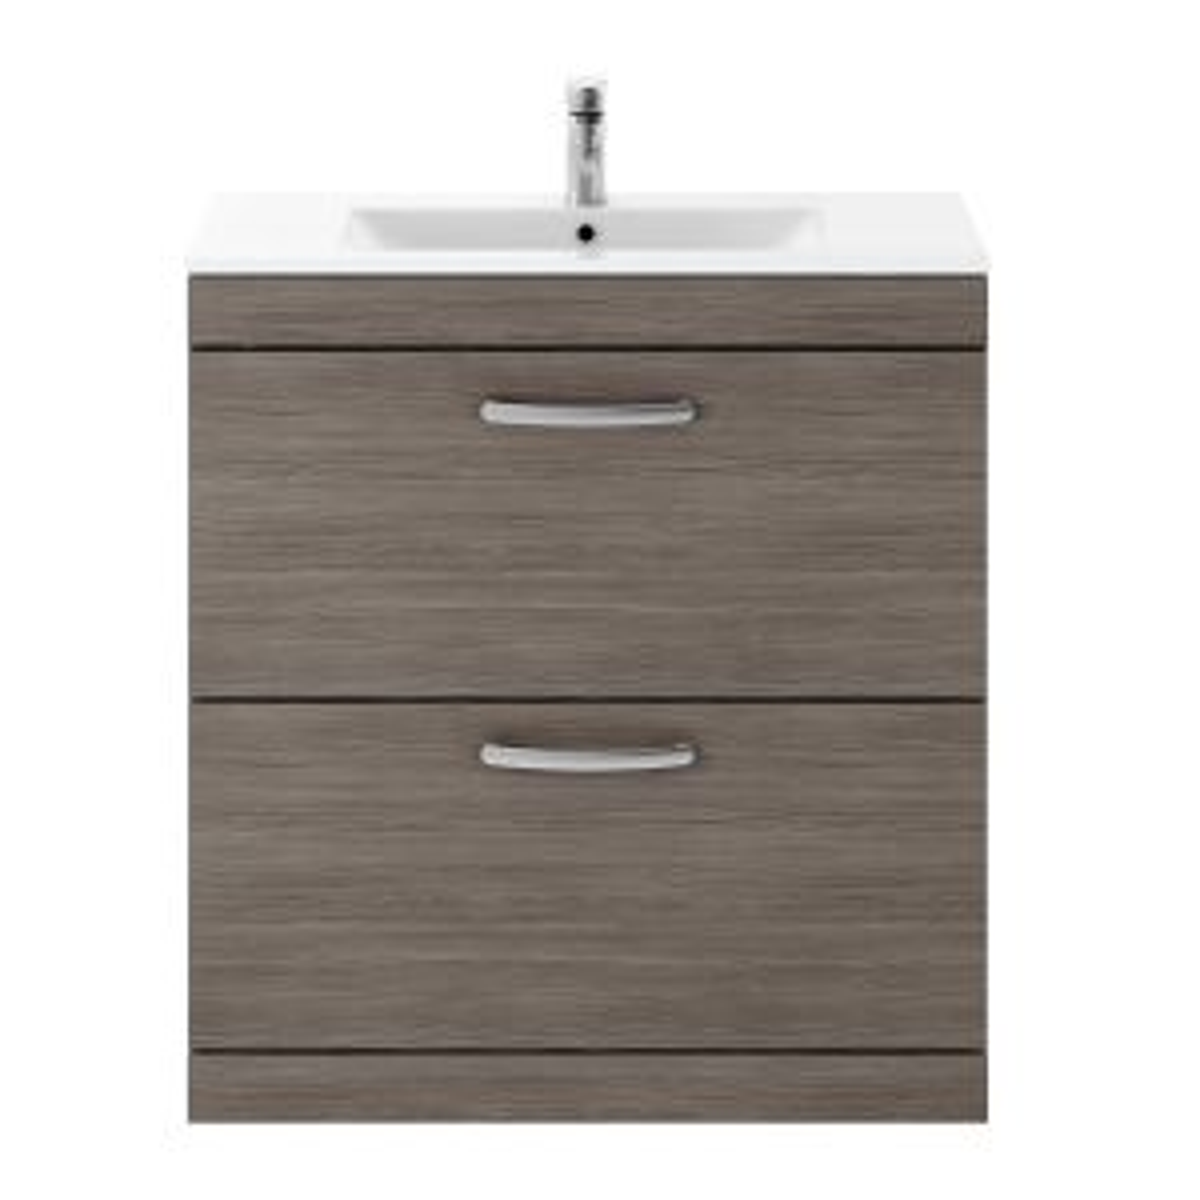 Nuie Athena Grey Avola 2 Drawer Floor Standing Vanity Unit with 18mm Profile Basin 800mm